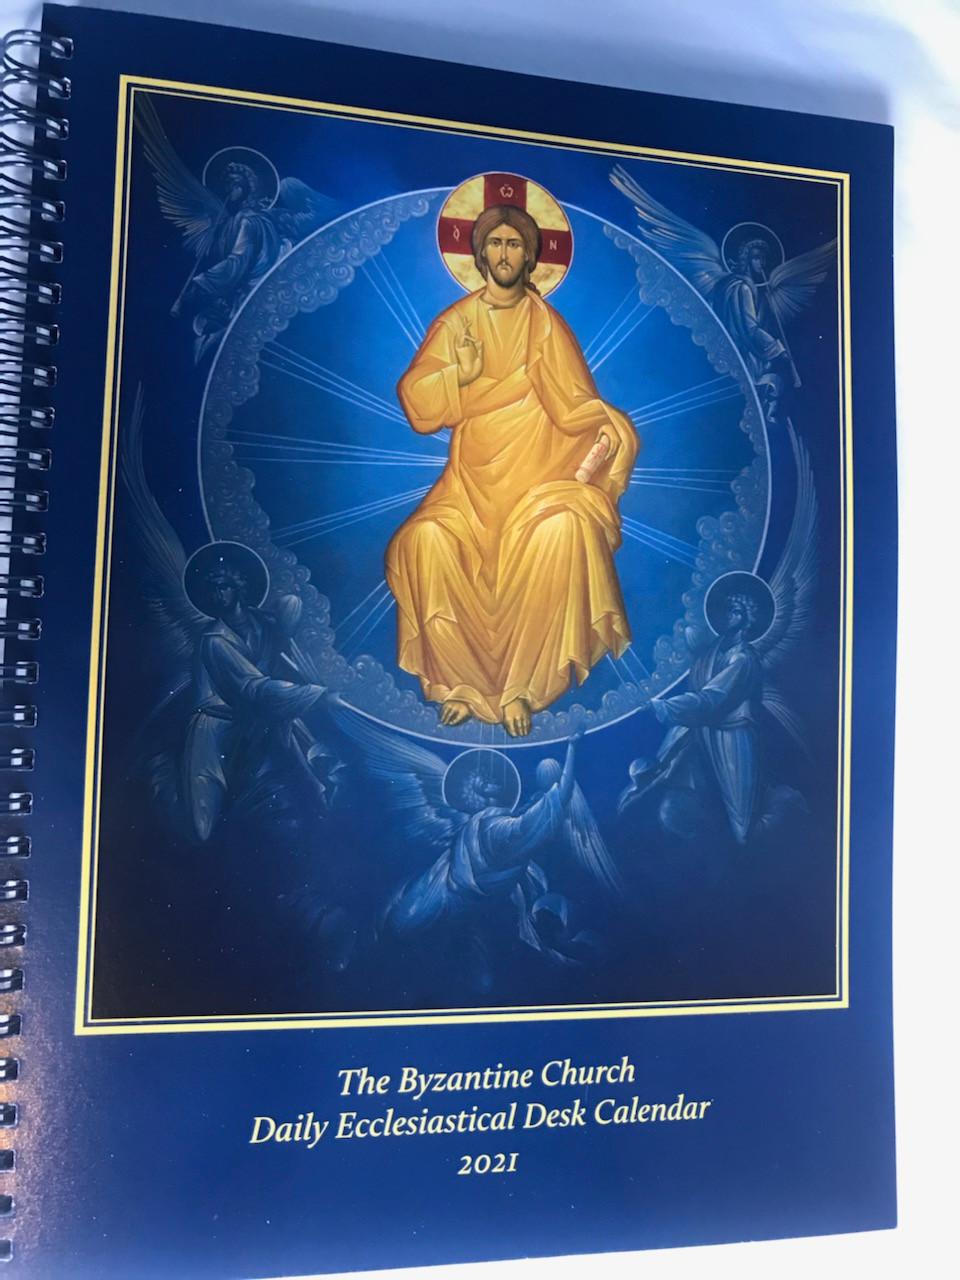 The Byzantine Church Daily Ecclesiastical Desk Calendar 2021